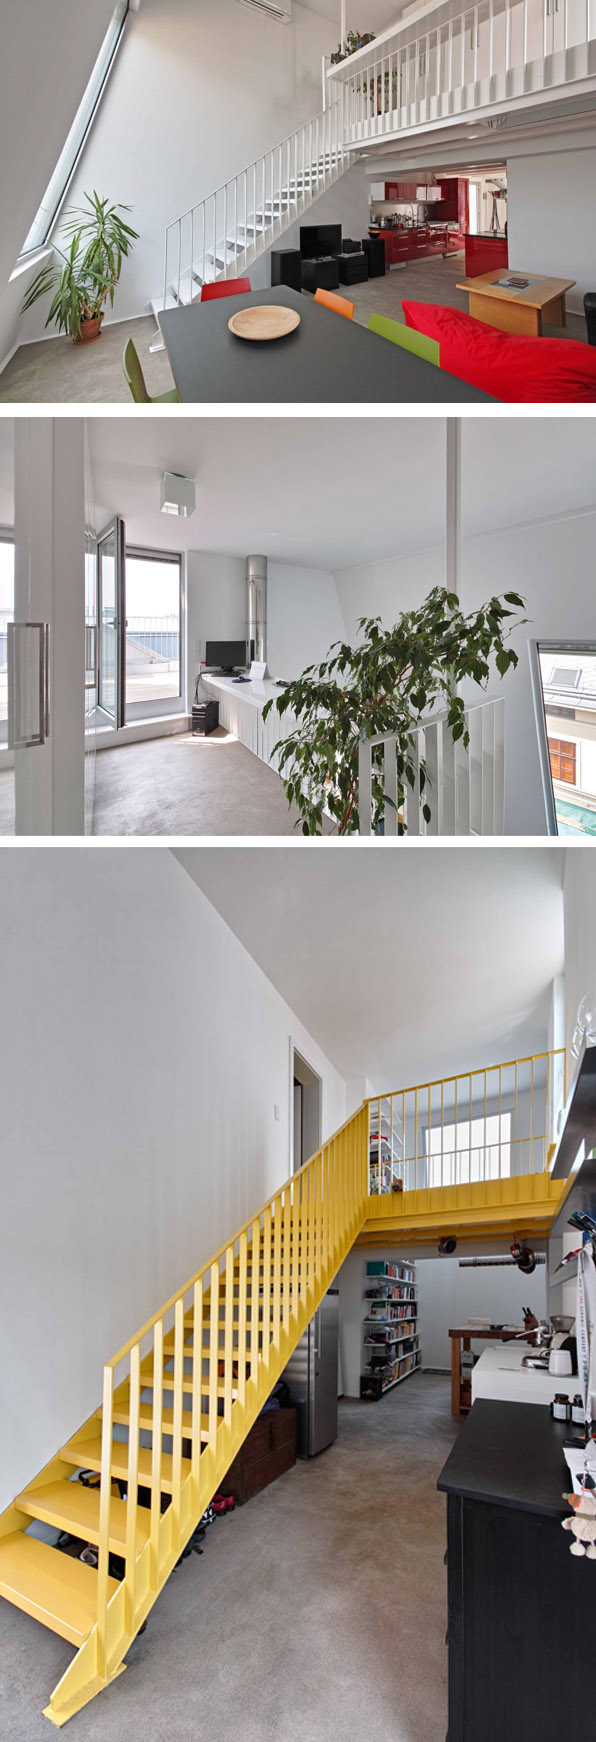 ppag architects radetzkystrasse en modusvivendi blog 3